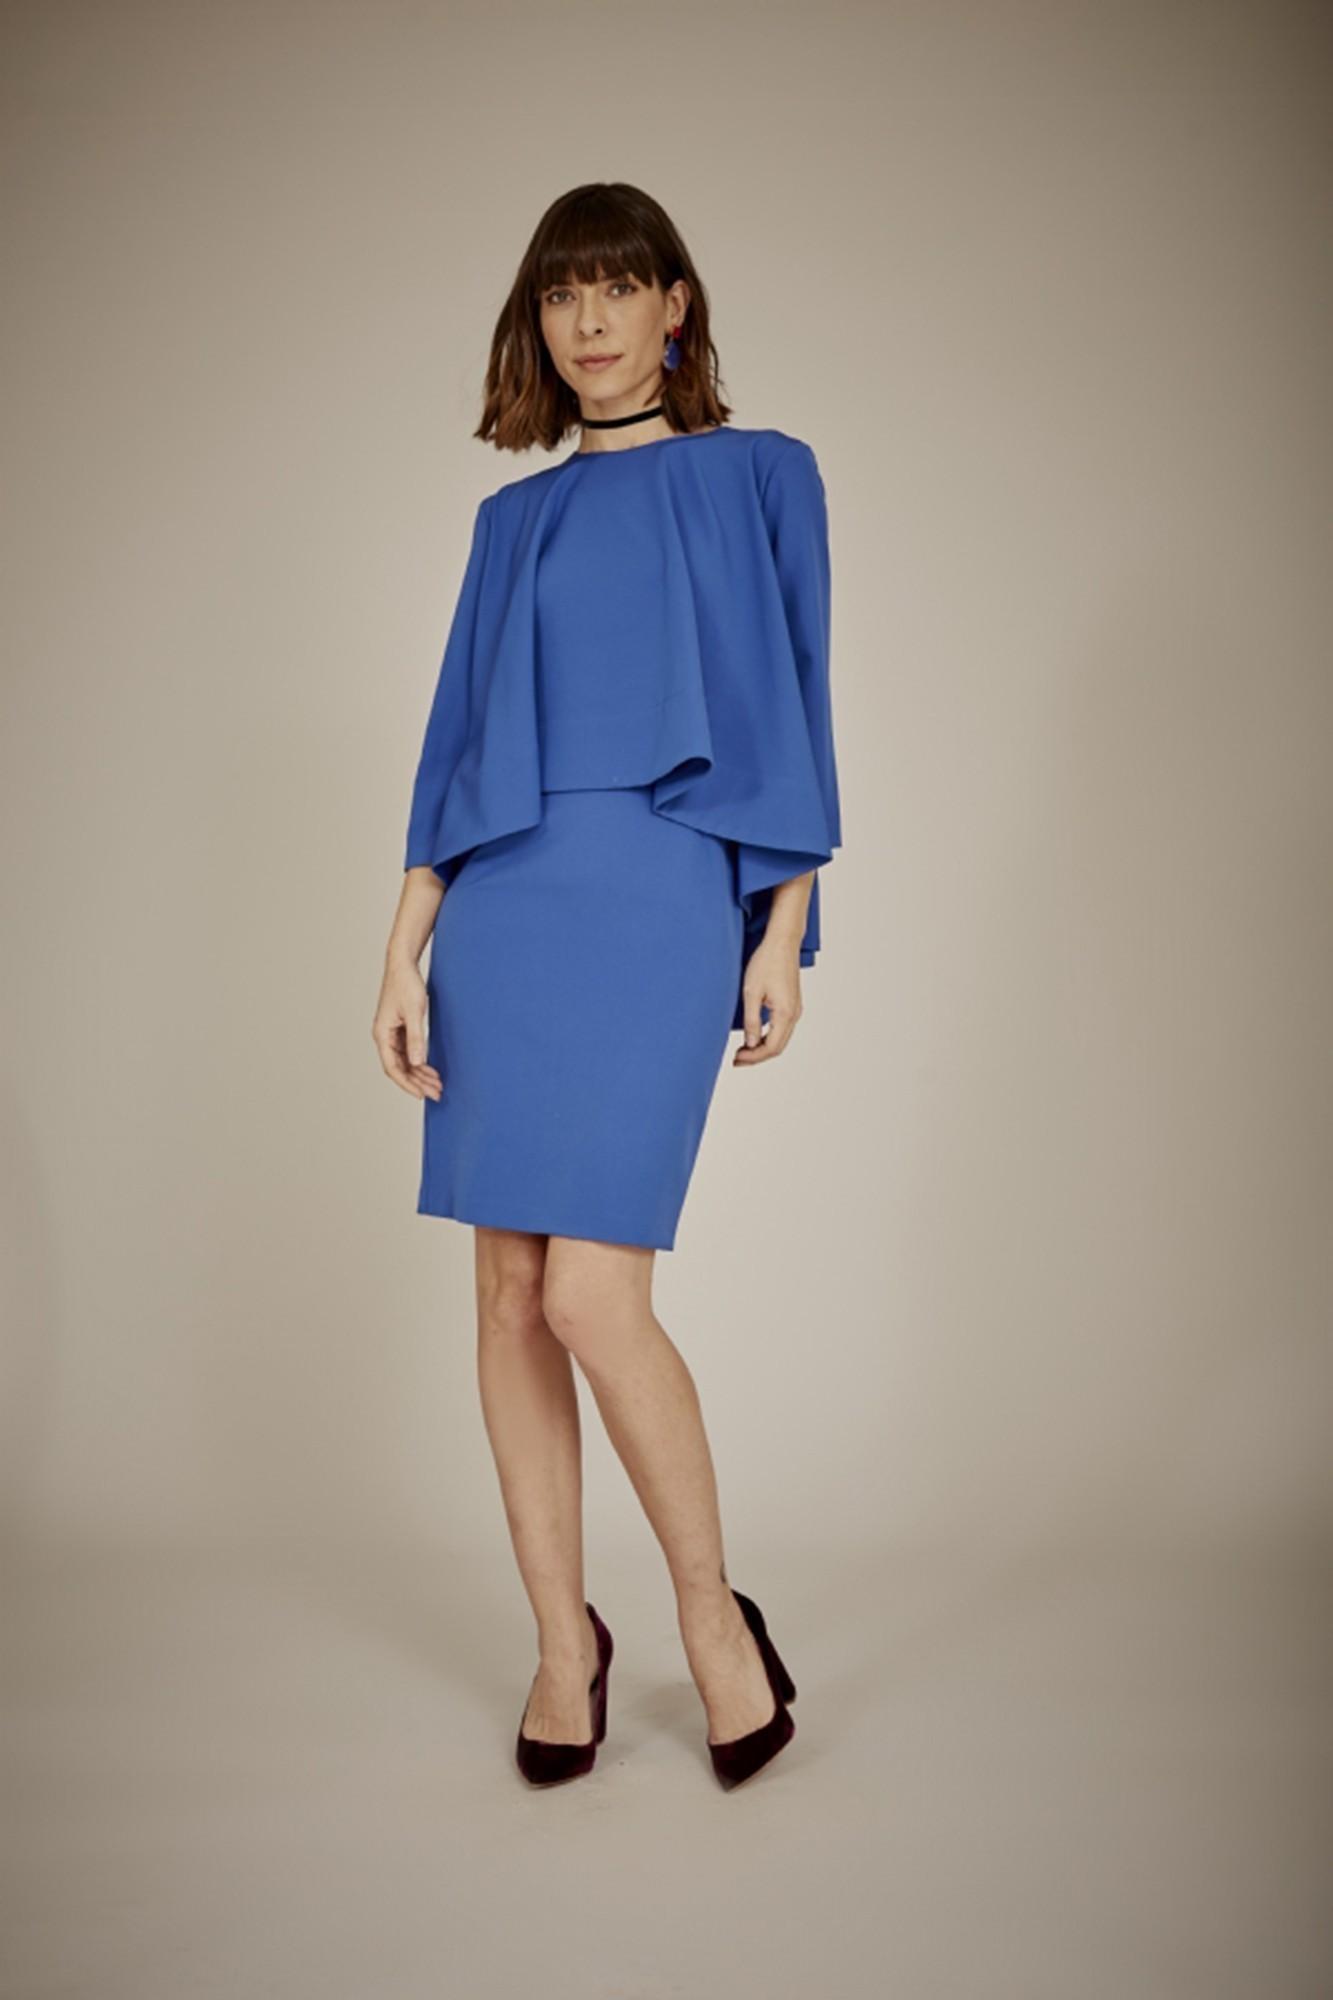 HILIA BLUE DRESS